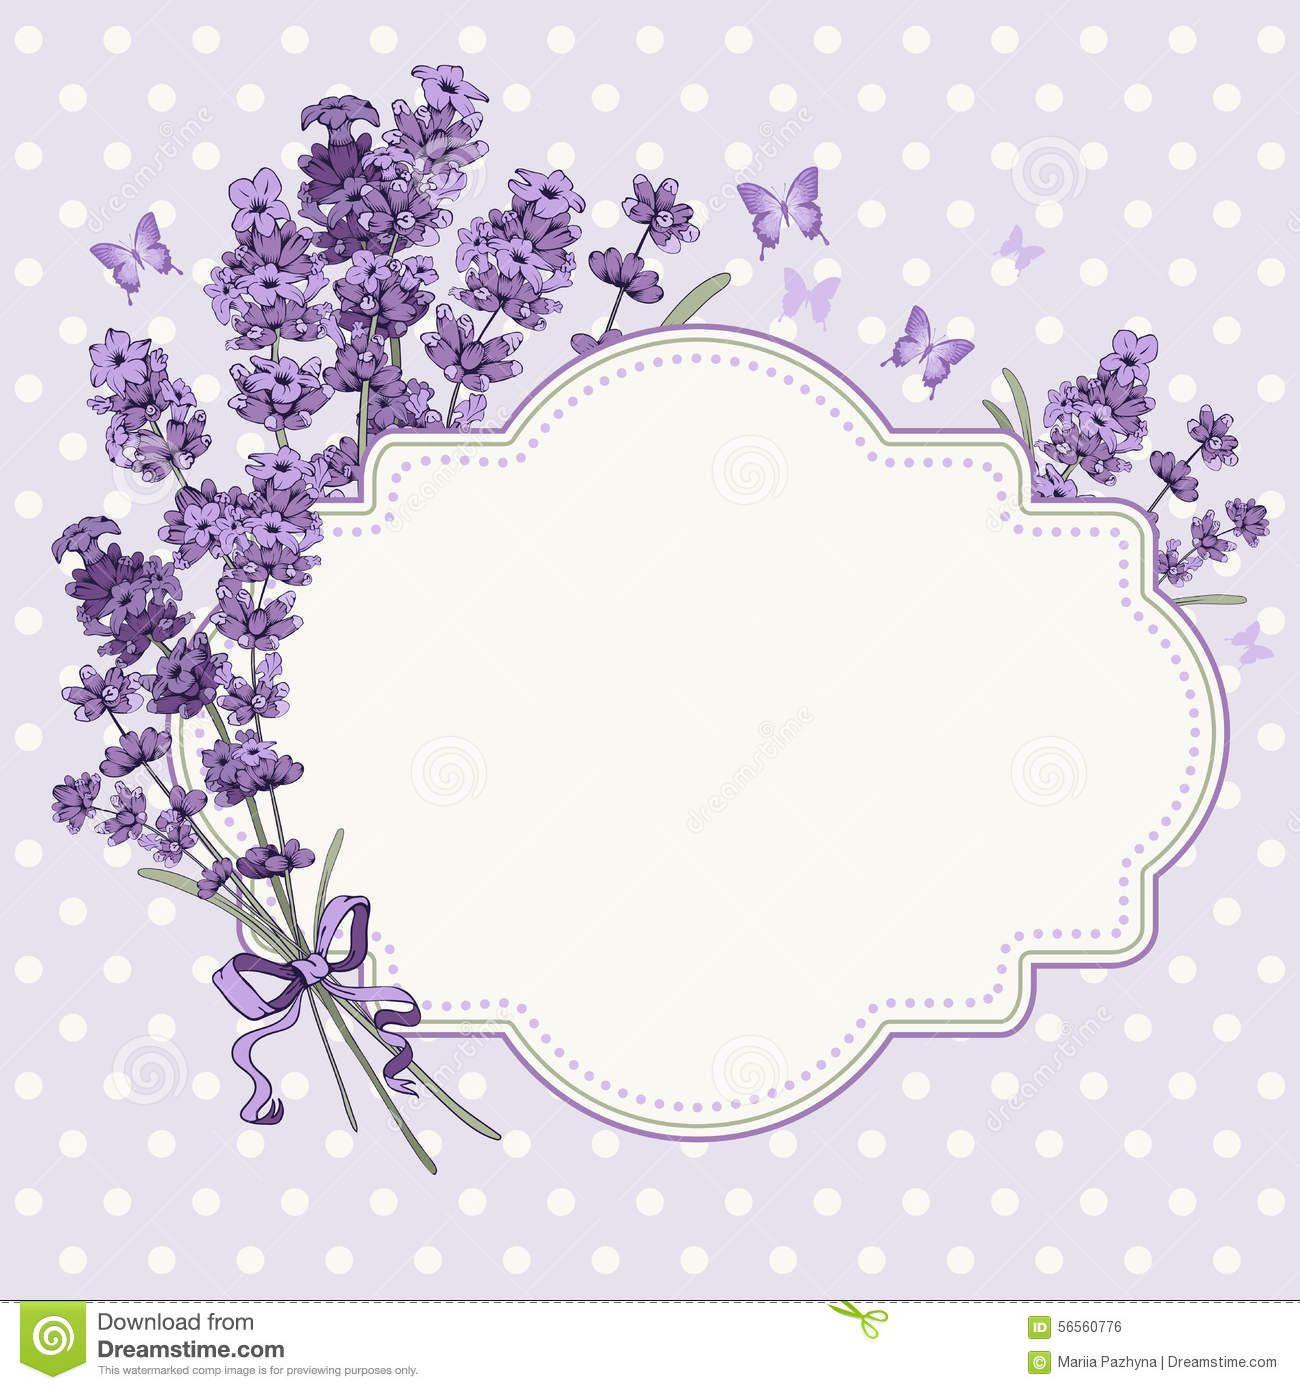 Lavender Card Cute Vintage Greeting Invitation Hand Drawn